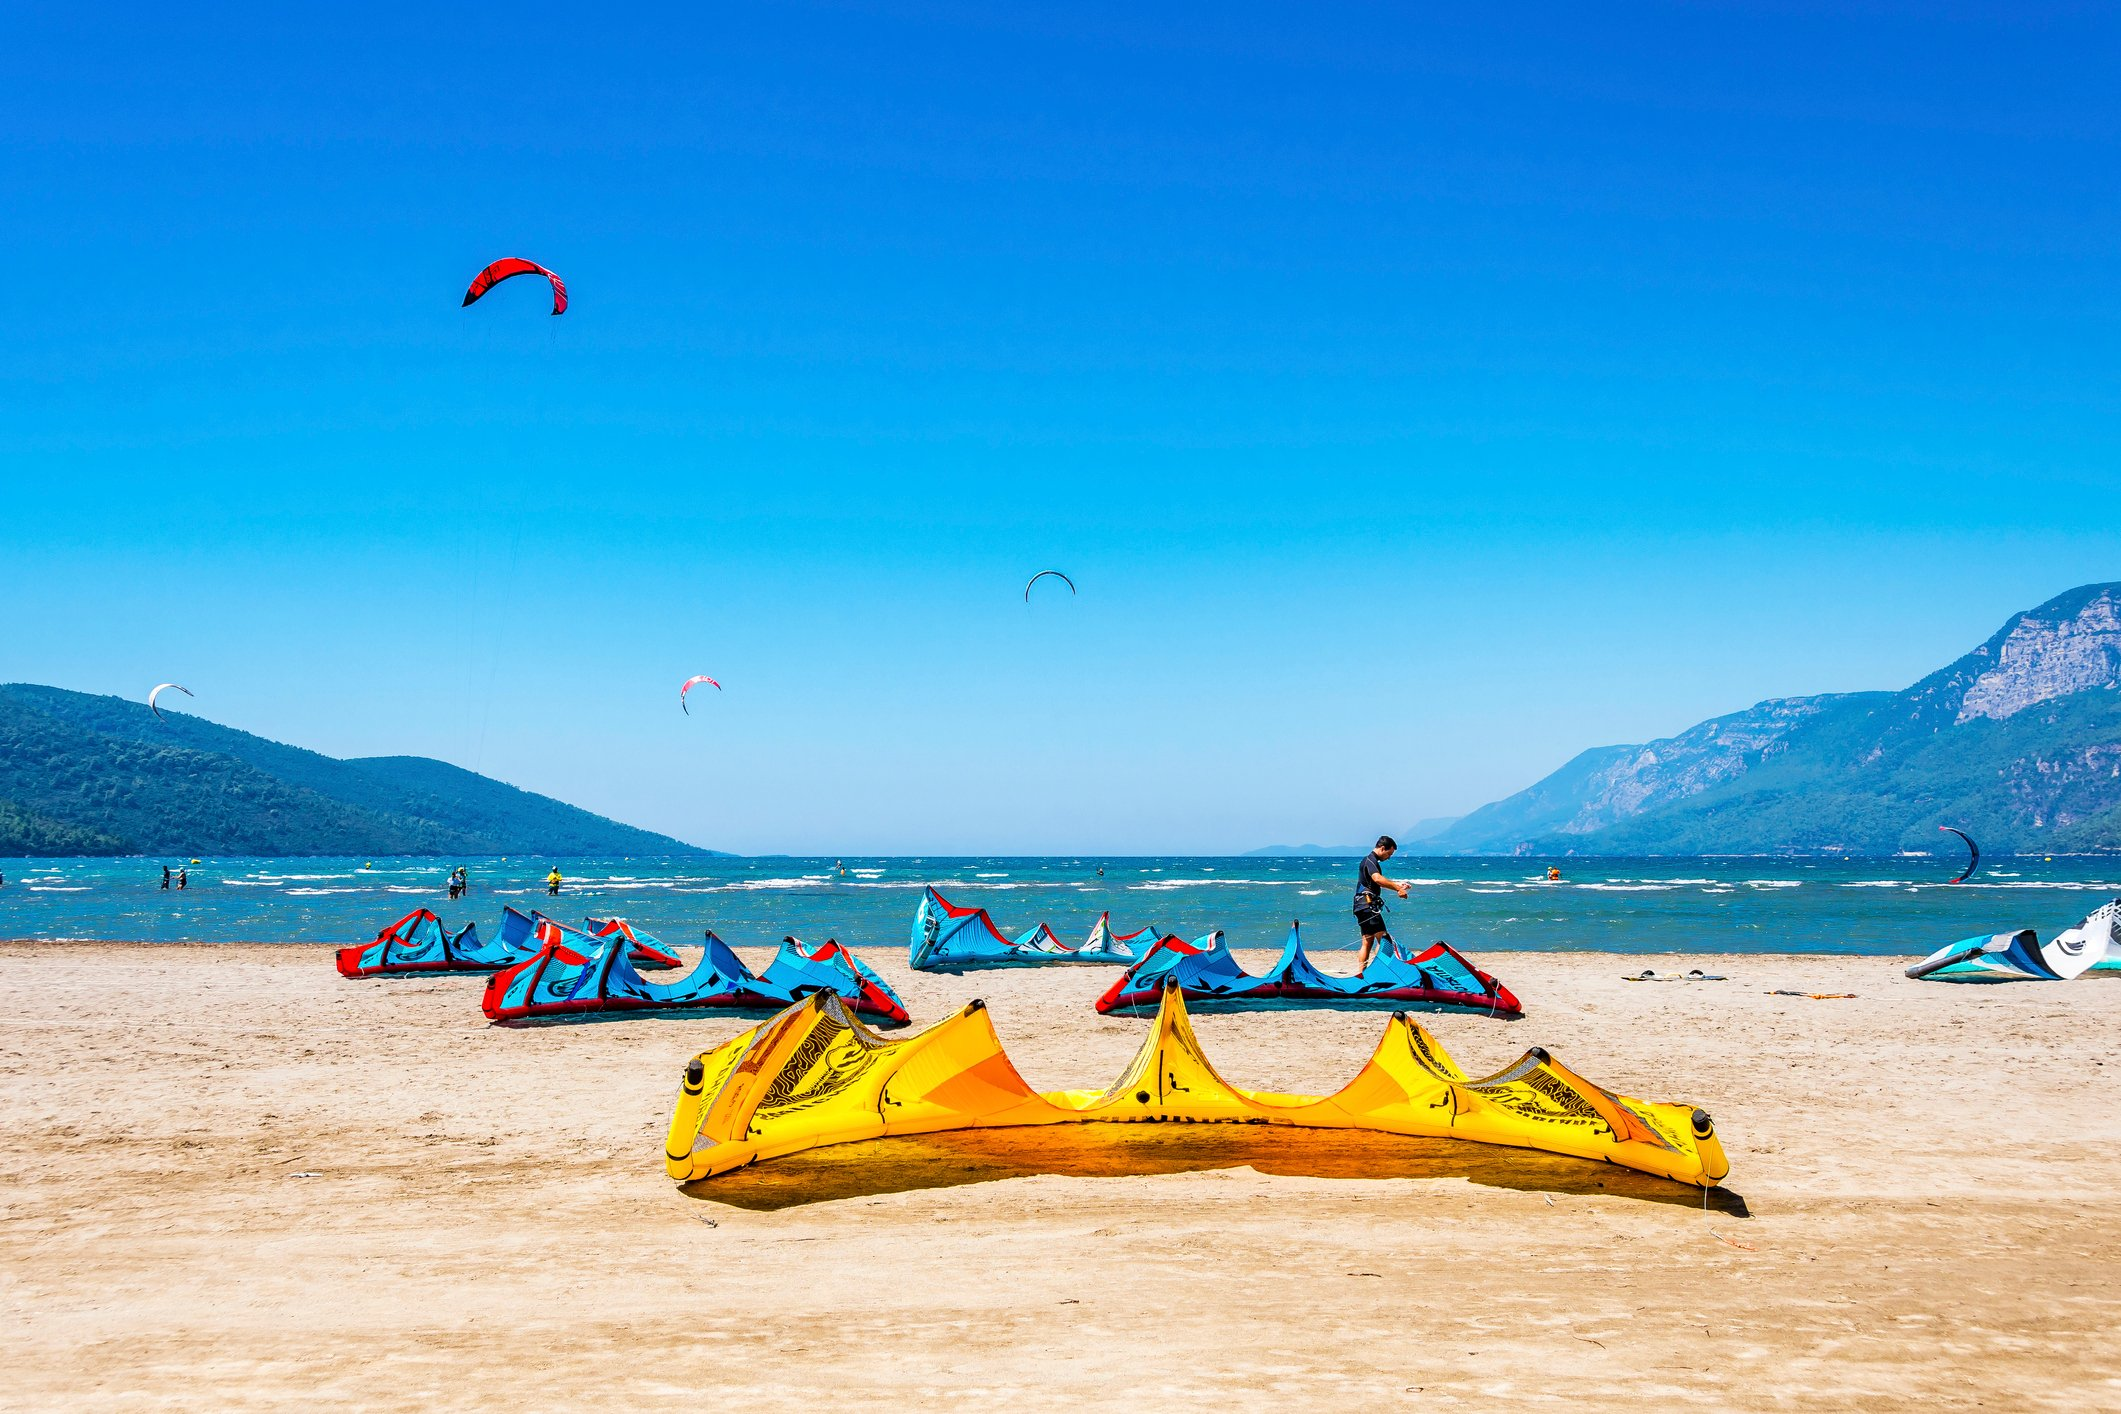 Akyaka draws hundreds of kitesurfers to the Gulf of Gökova every year. (iStock Photo)